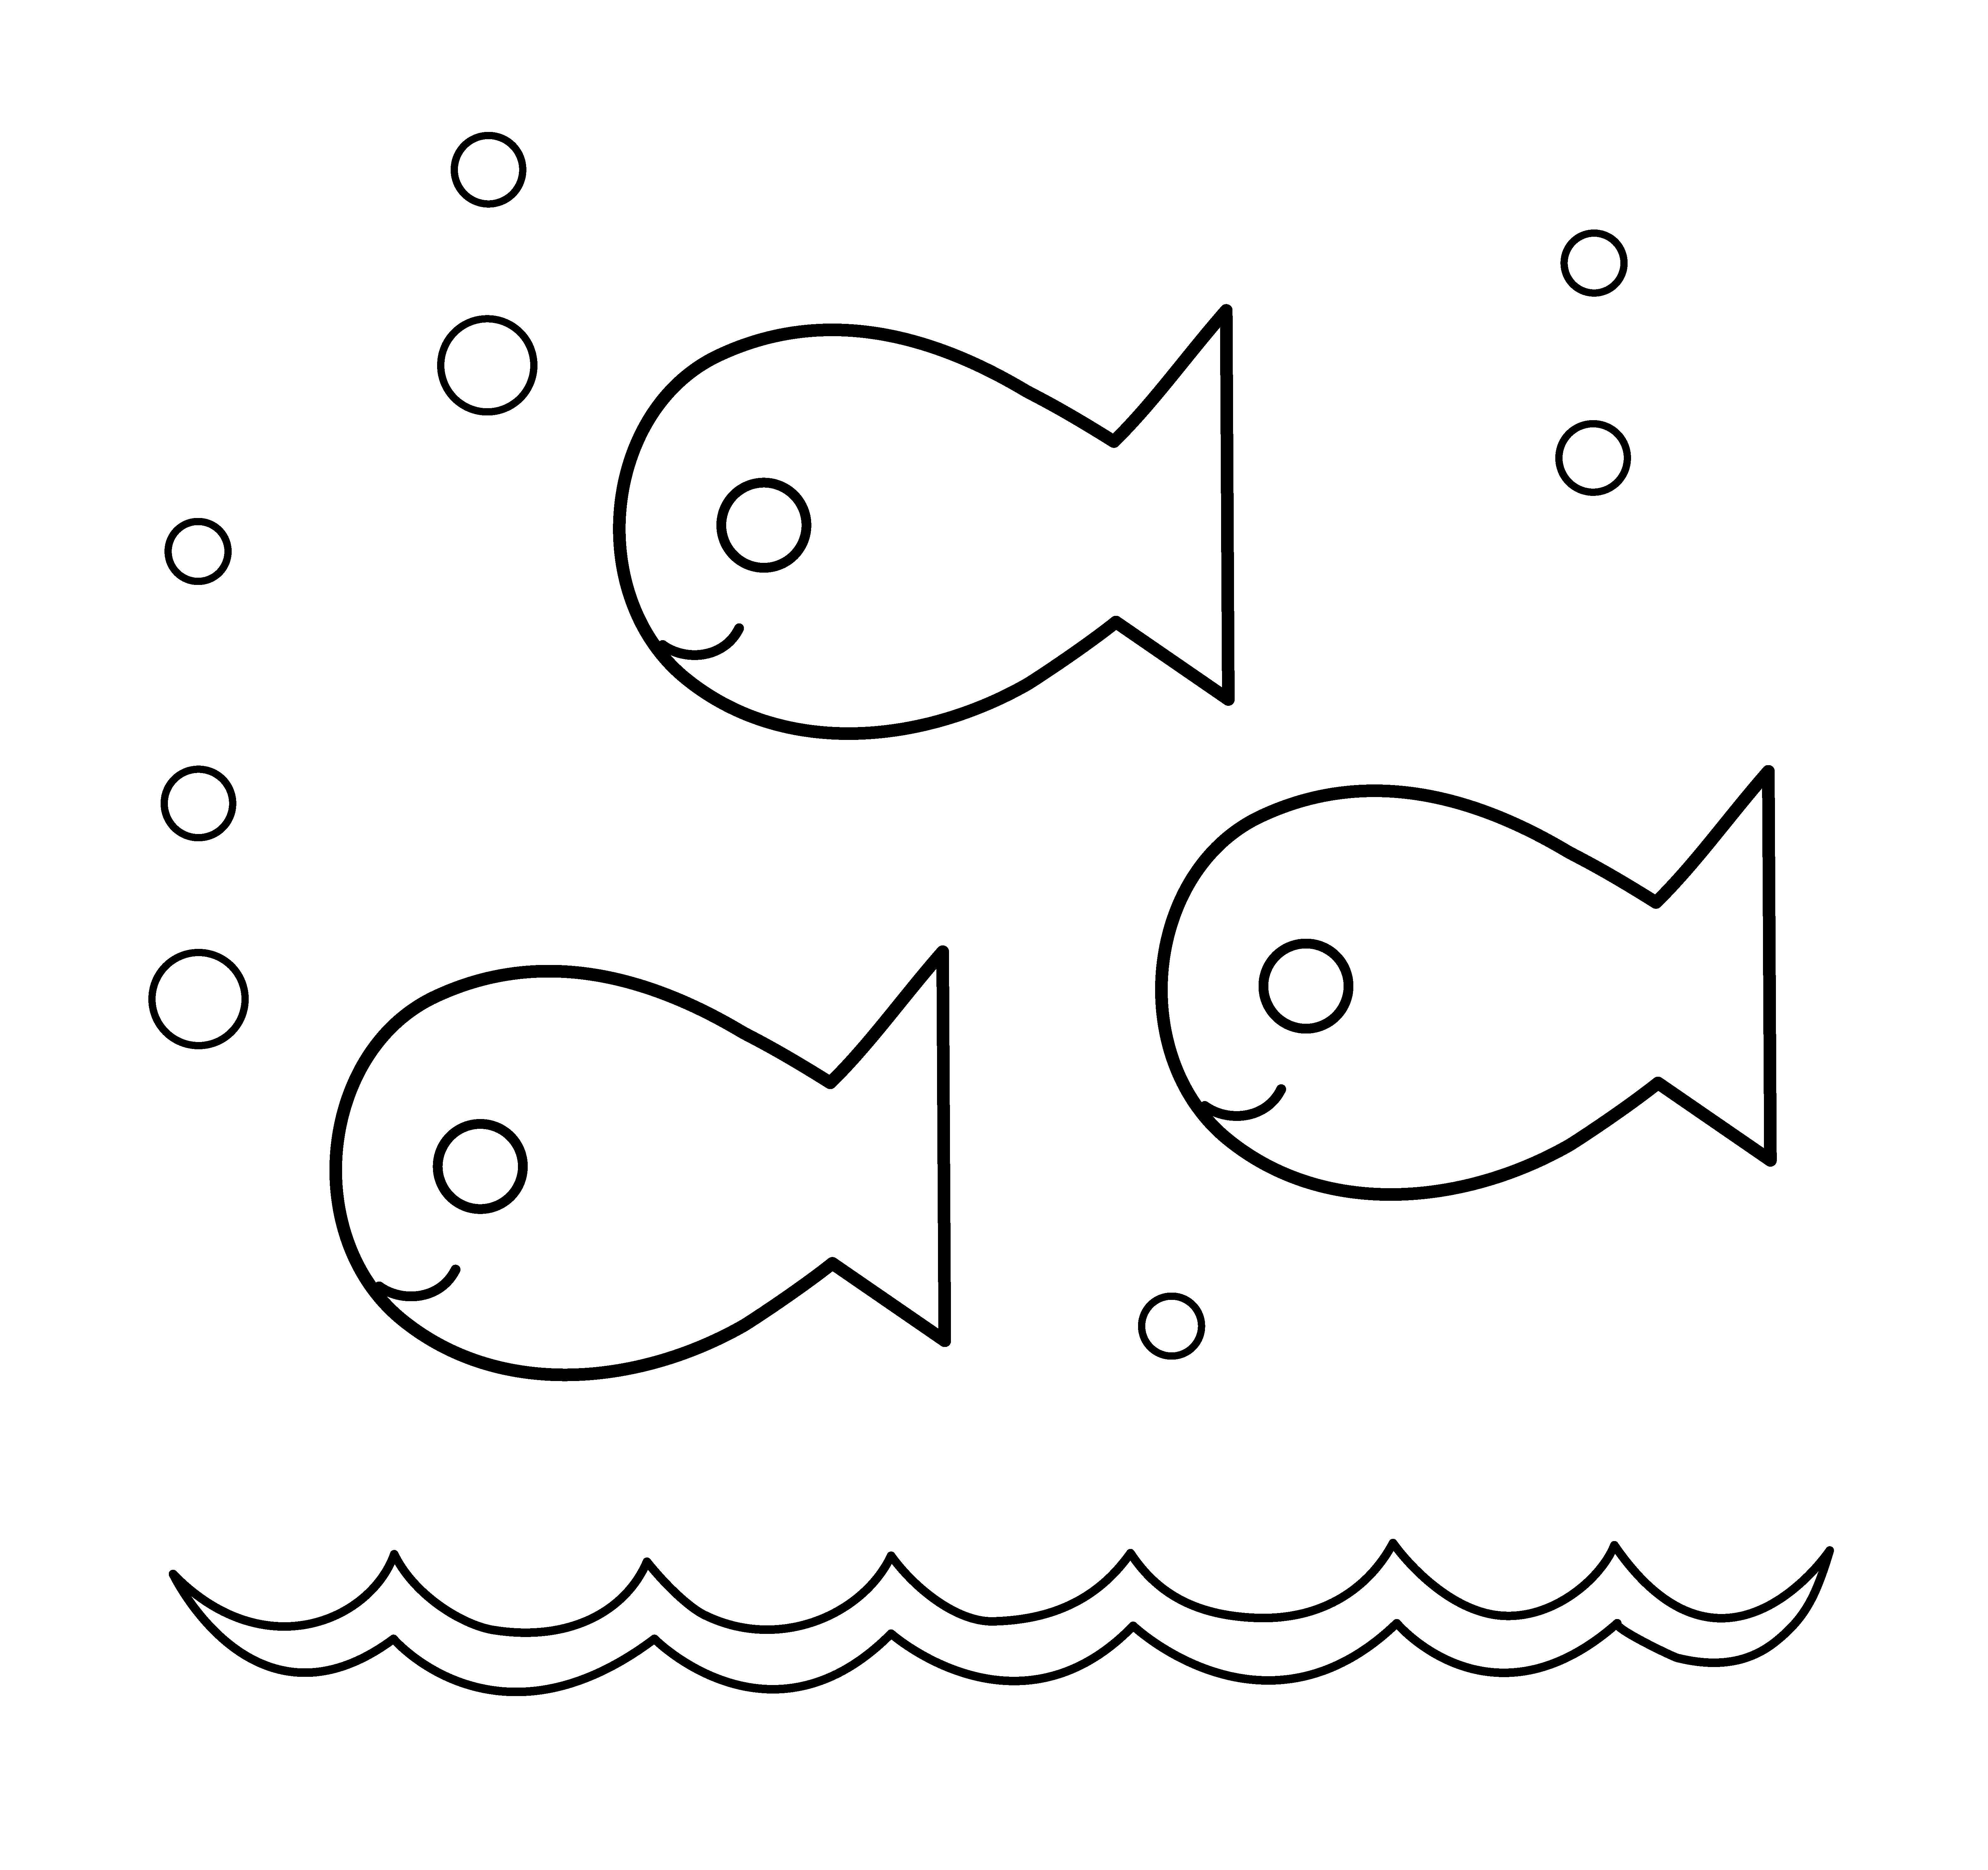 Fish Images Free